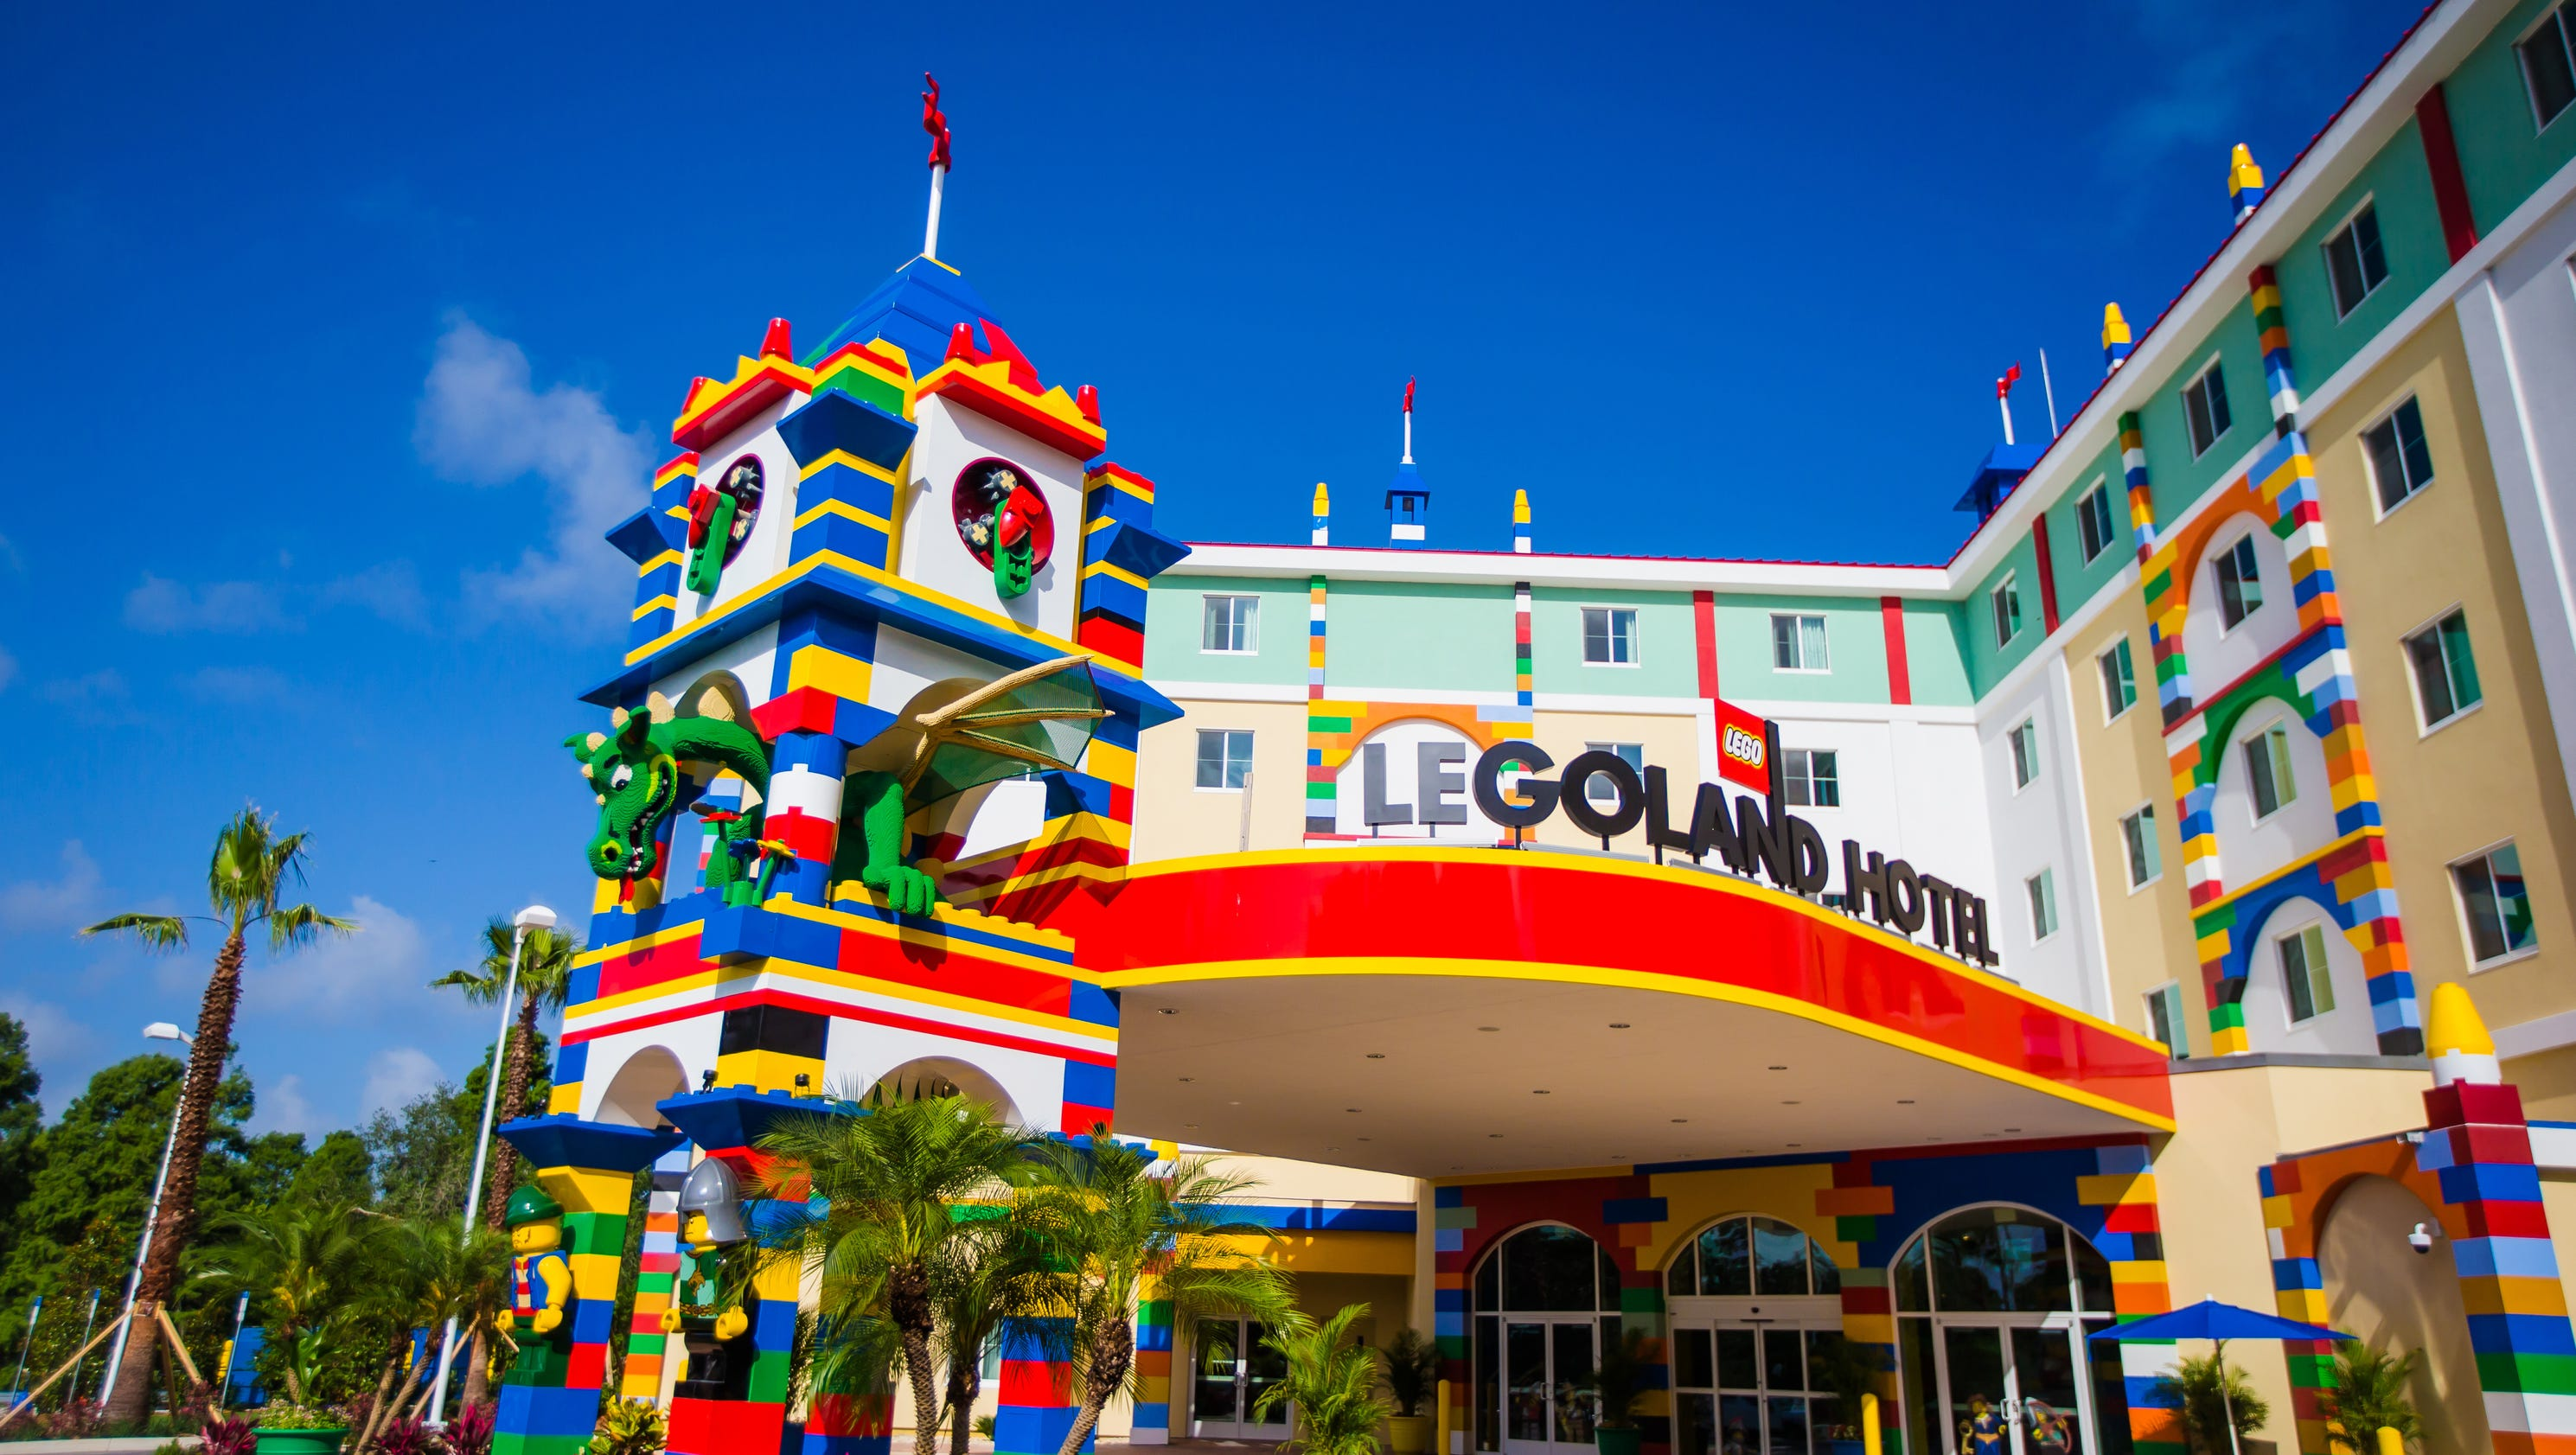 Legoland Officials Eyeing Move To Ramapo